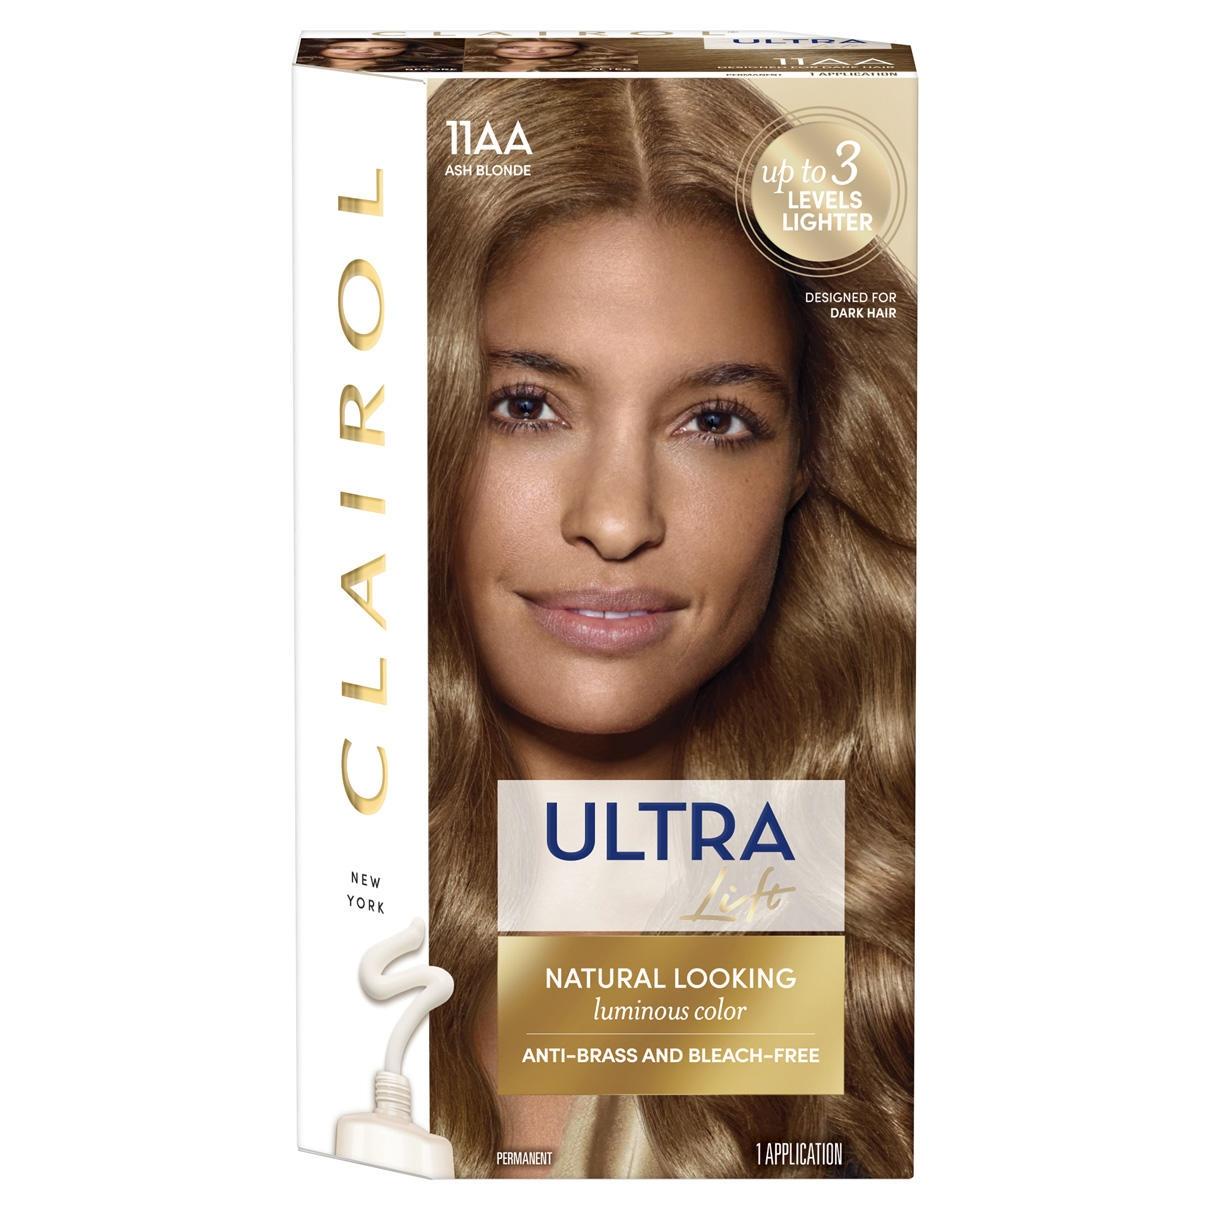 Ultra Lift Clairol